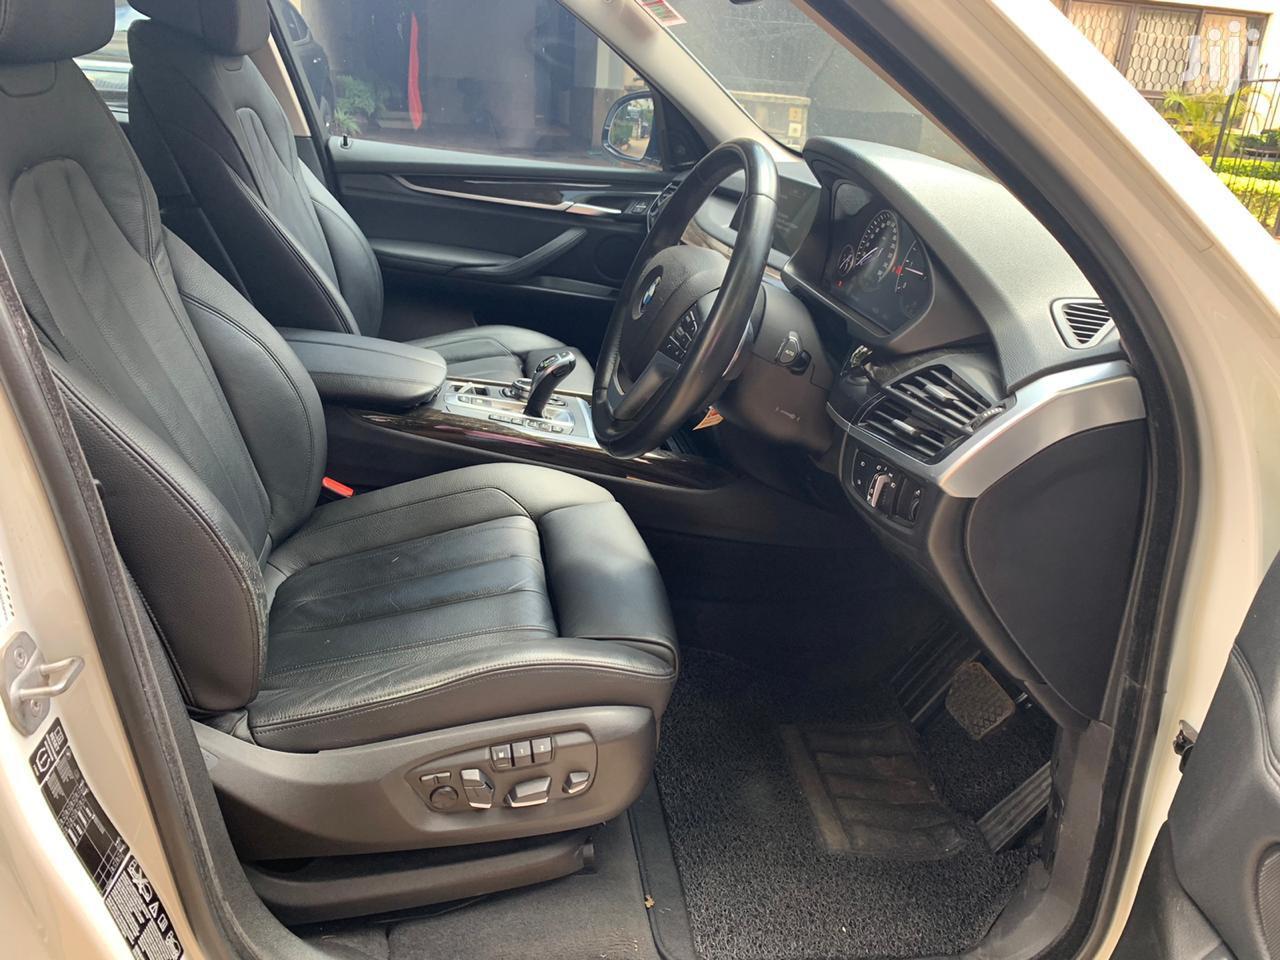 BMW X5 2014 White | Cars for sale in Lavington, Nairobi, Kenya